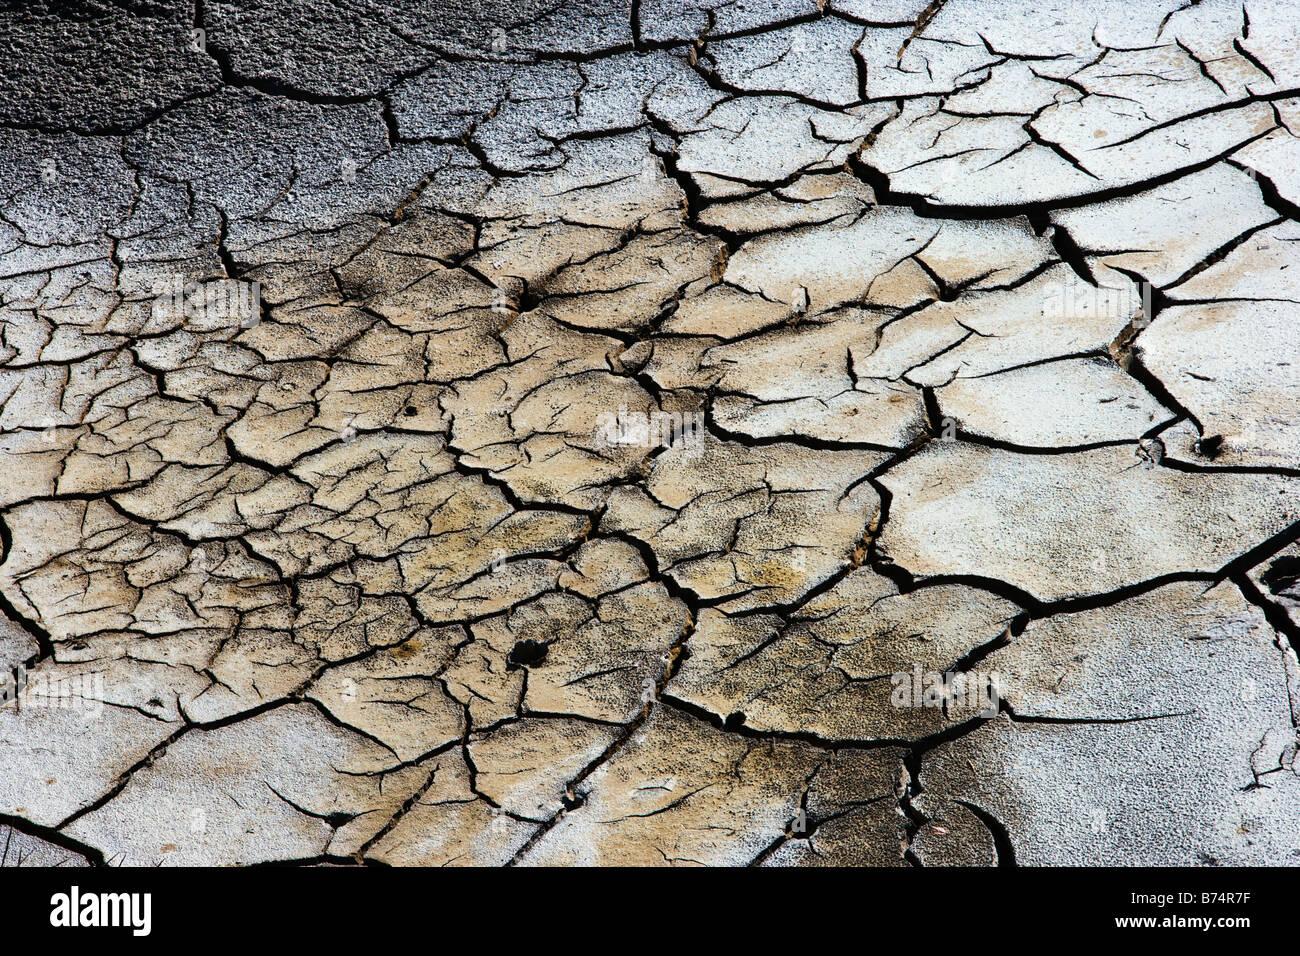 Neuseeland, Nordinsel, Waiotapu, Thermalbereich. Rissige Erde. Stockbild